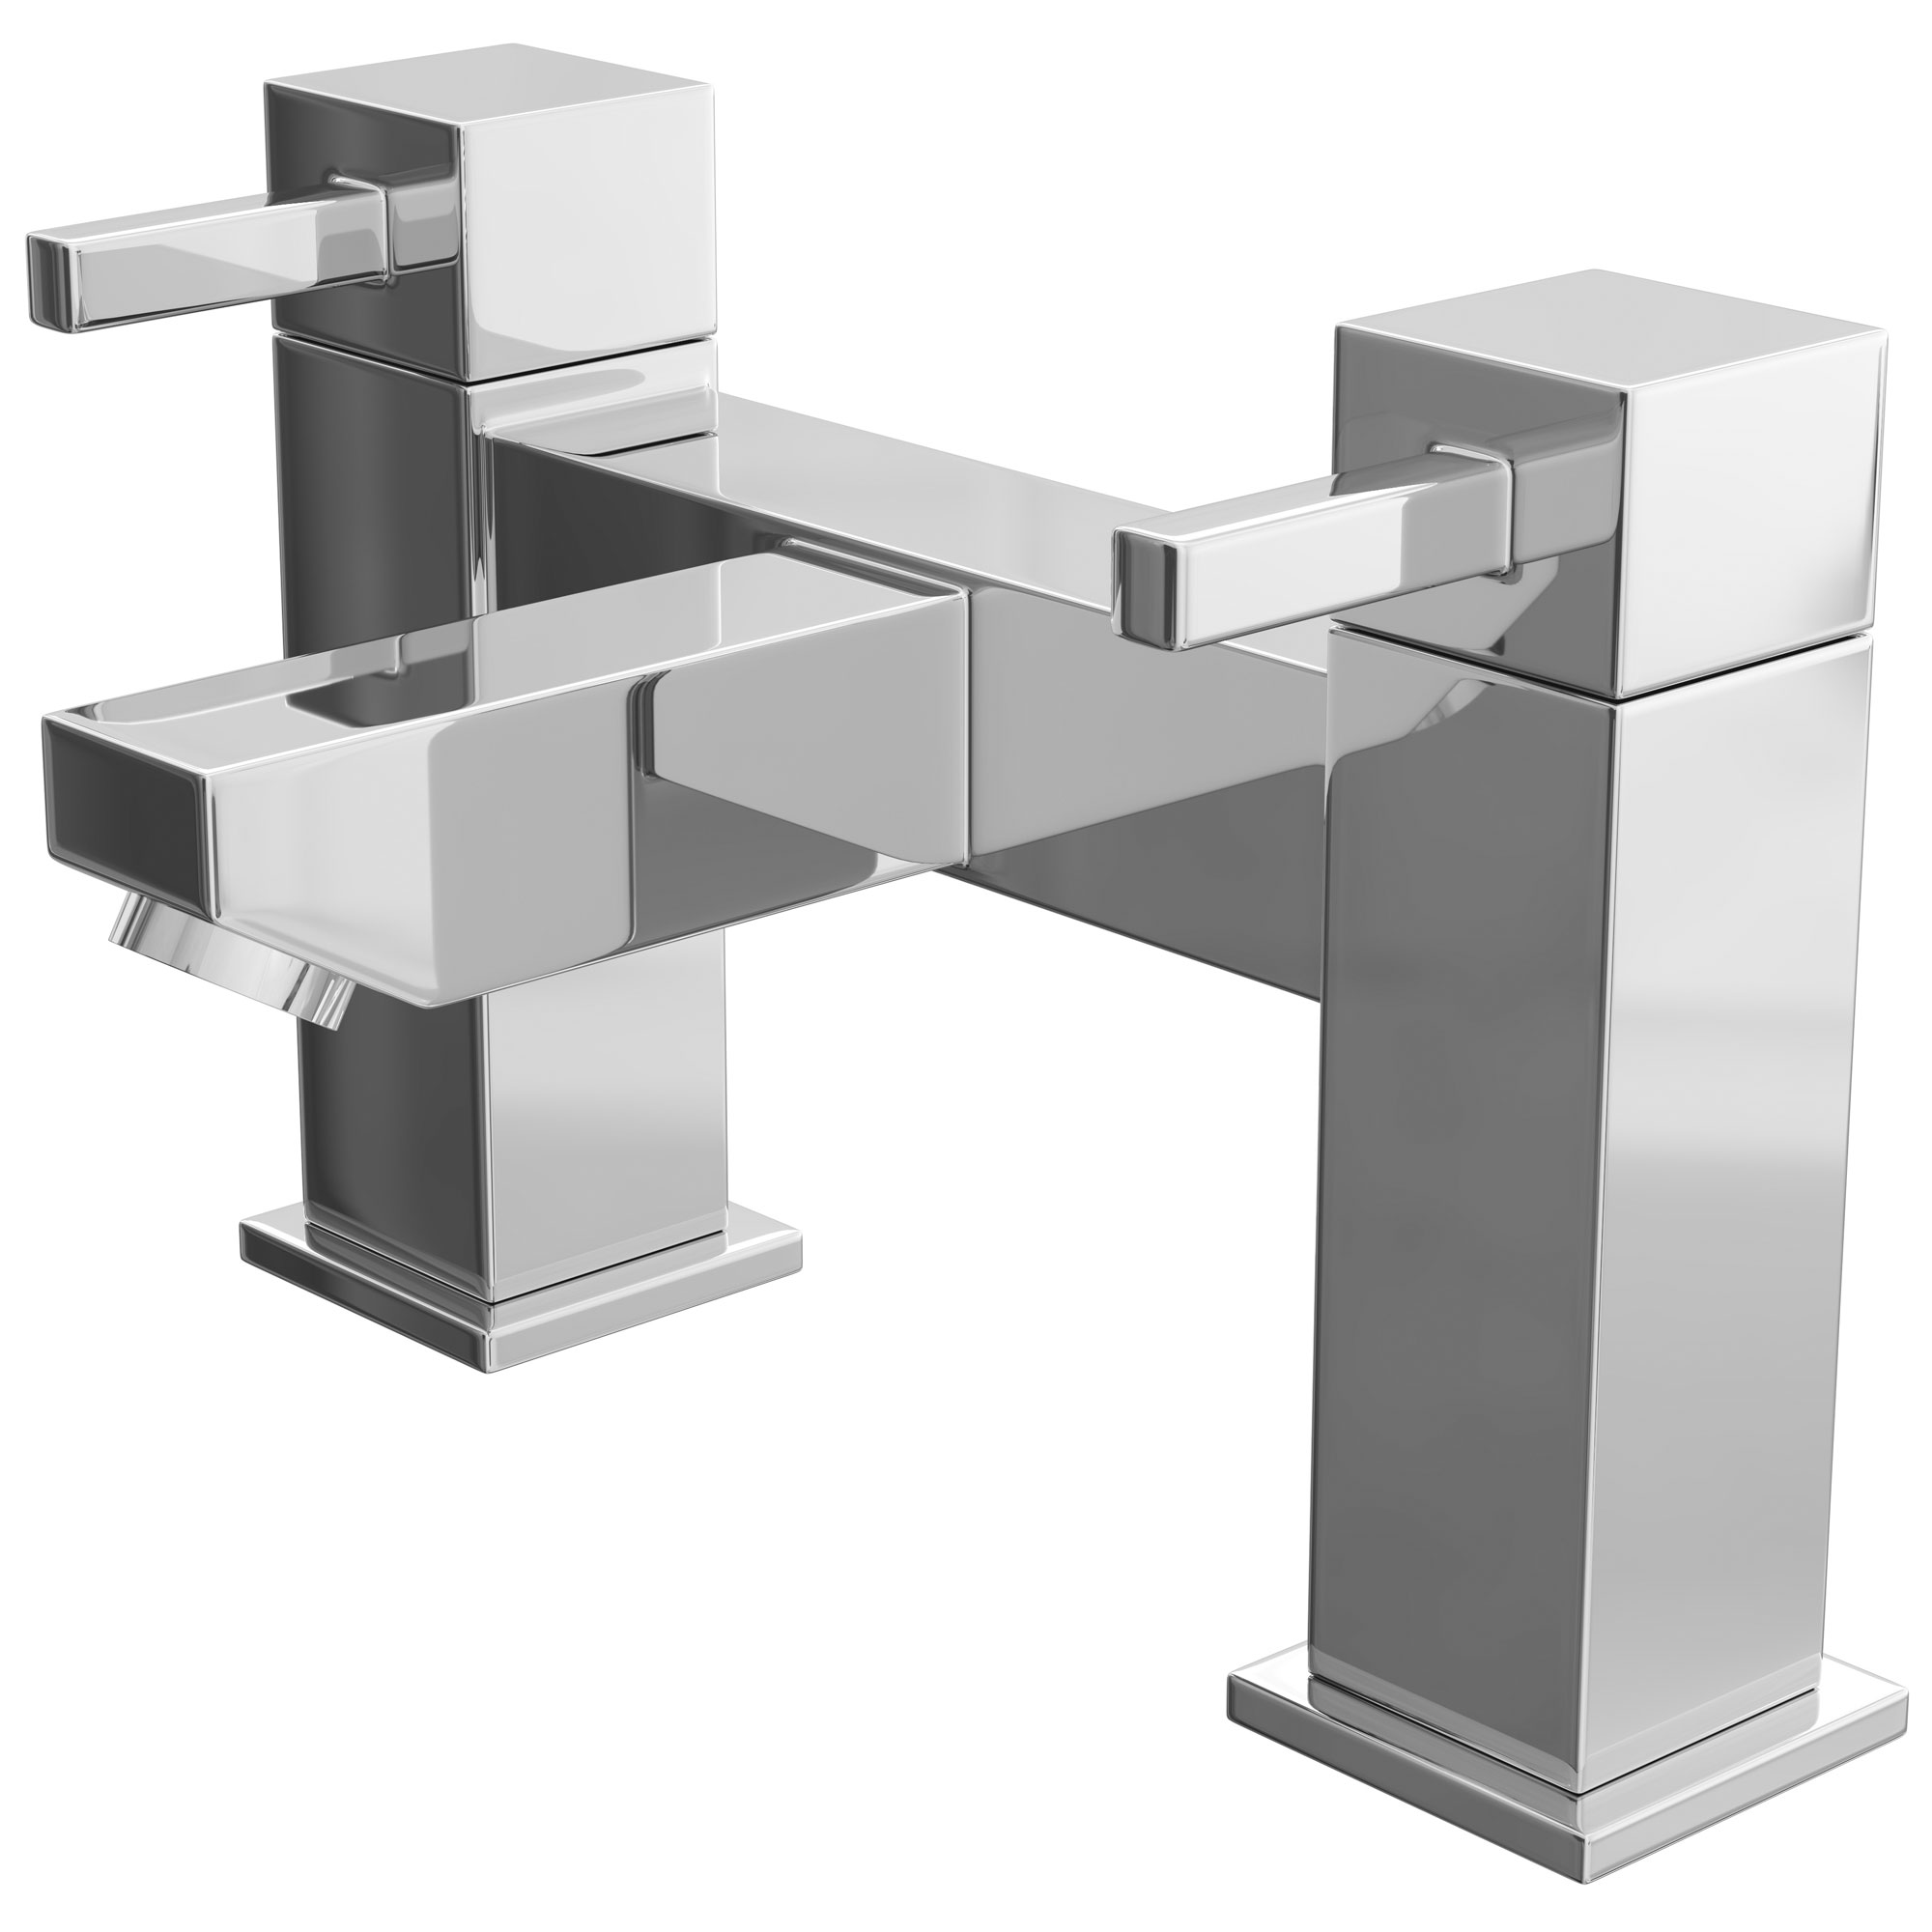 Cali Emperor Bath Filler Tap - Deck Mounted - Chrome-2